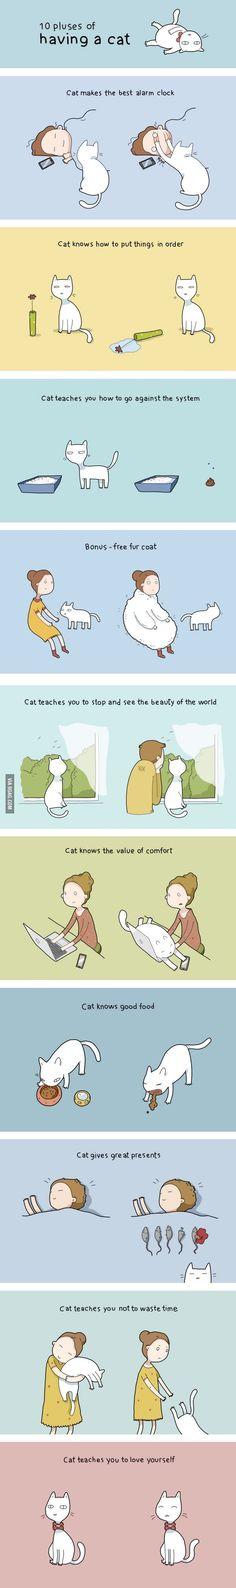 10 beneficios de tener un gato - Benefits of owning a cat :)